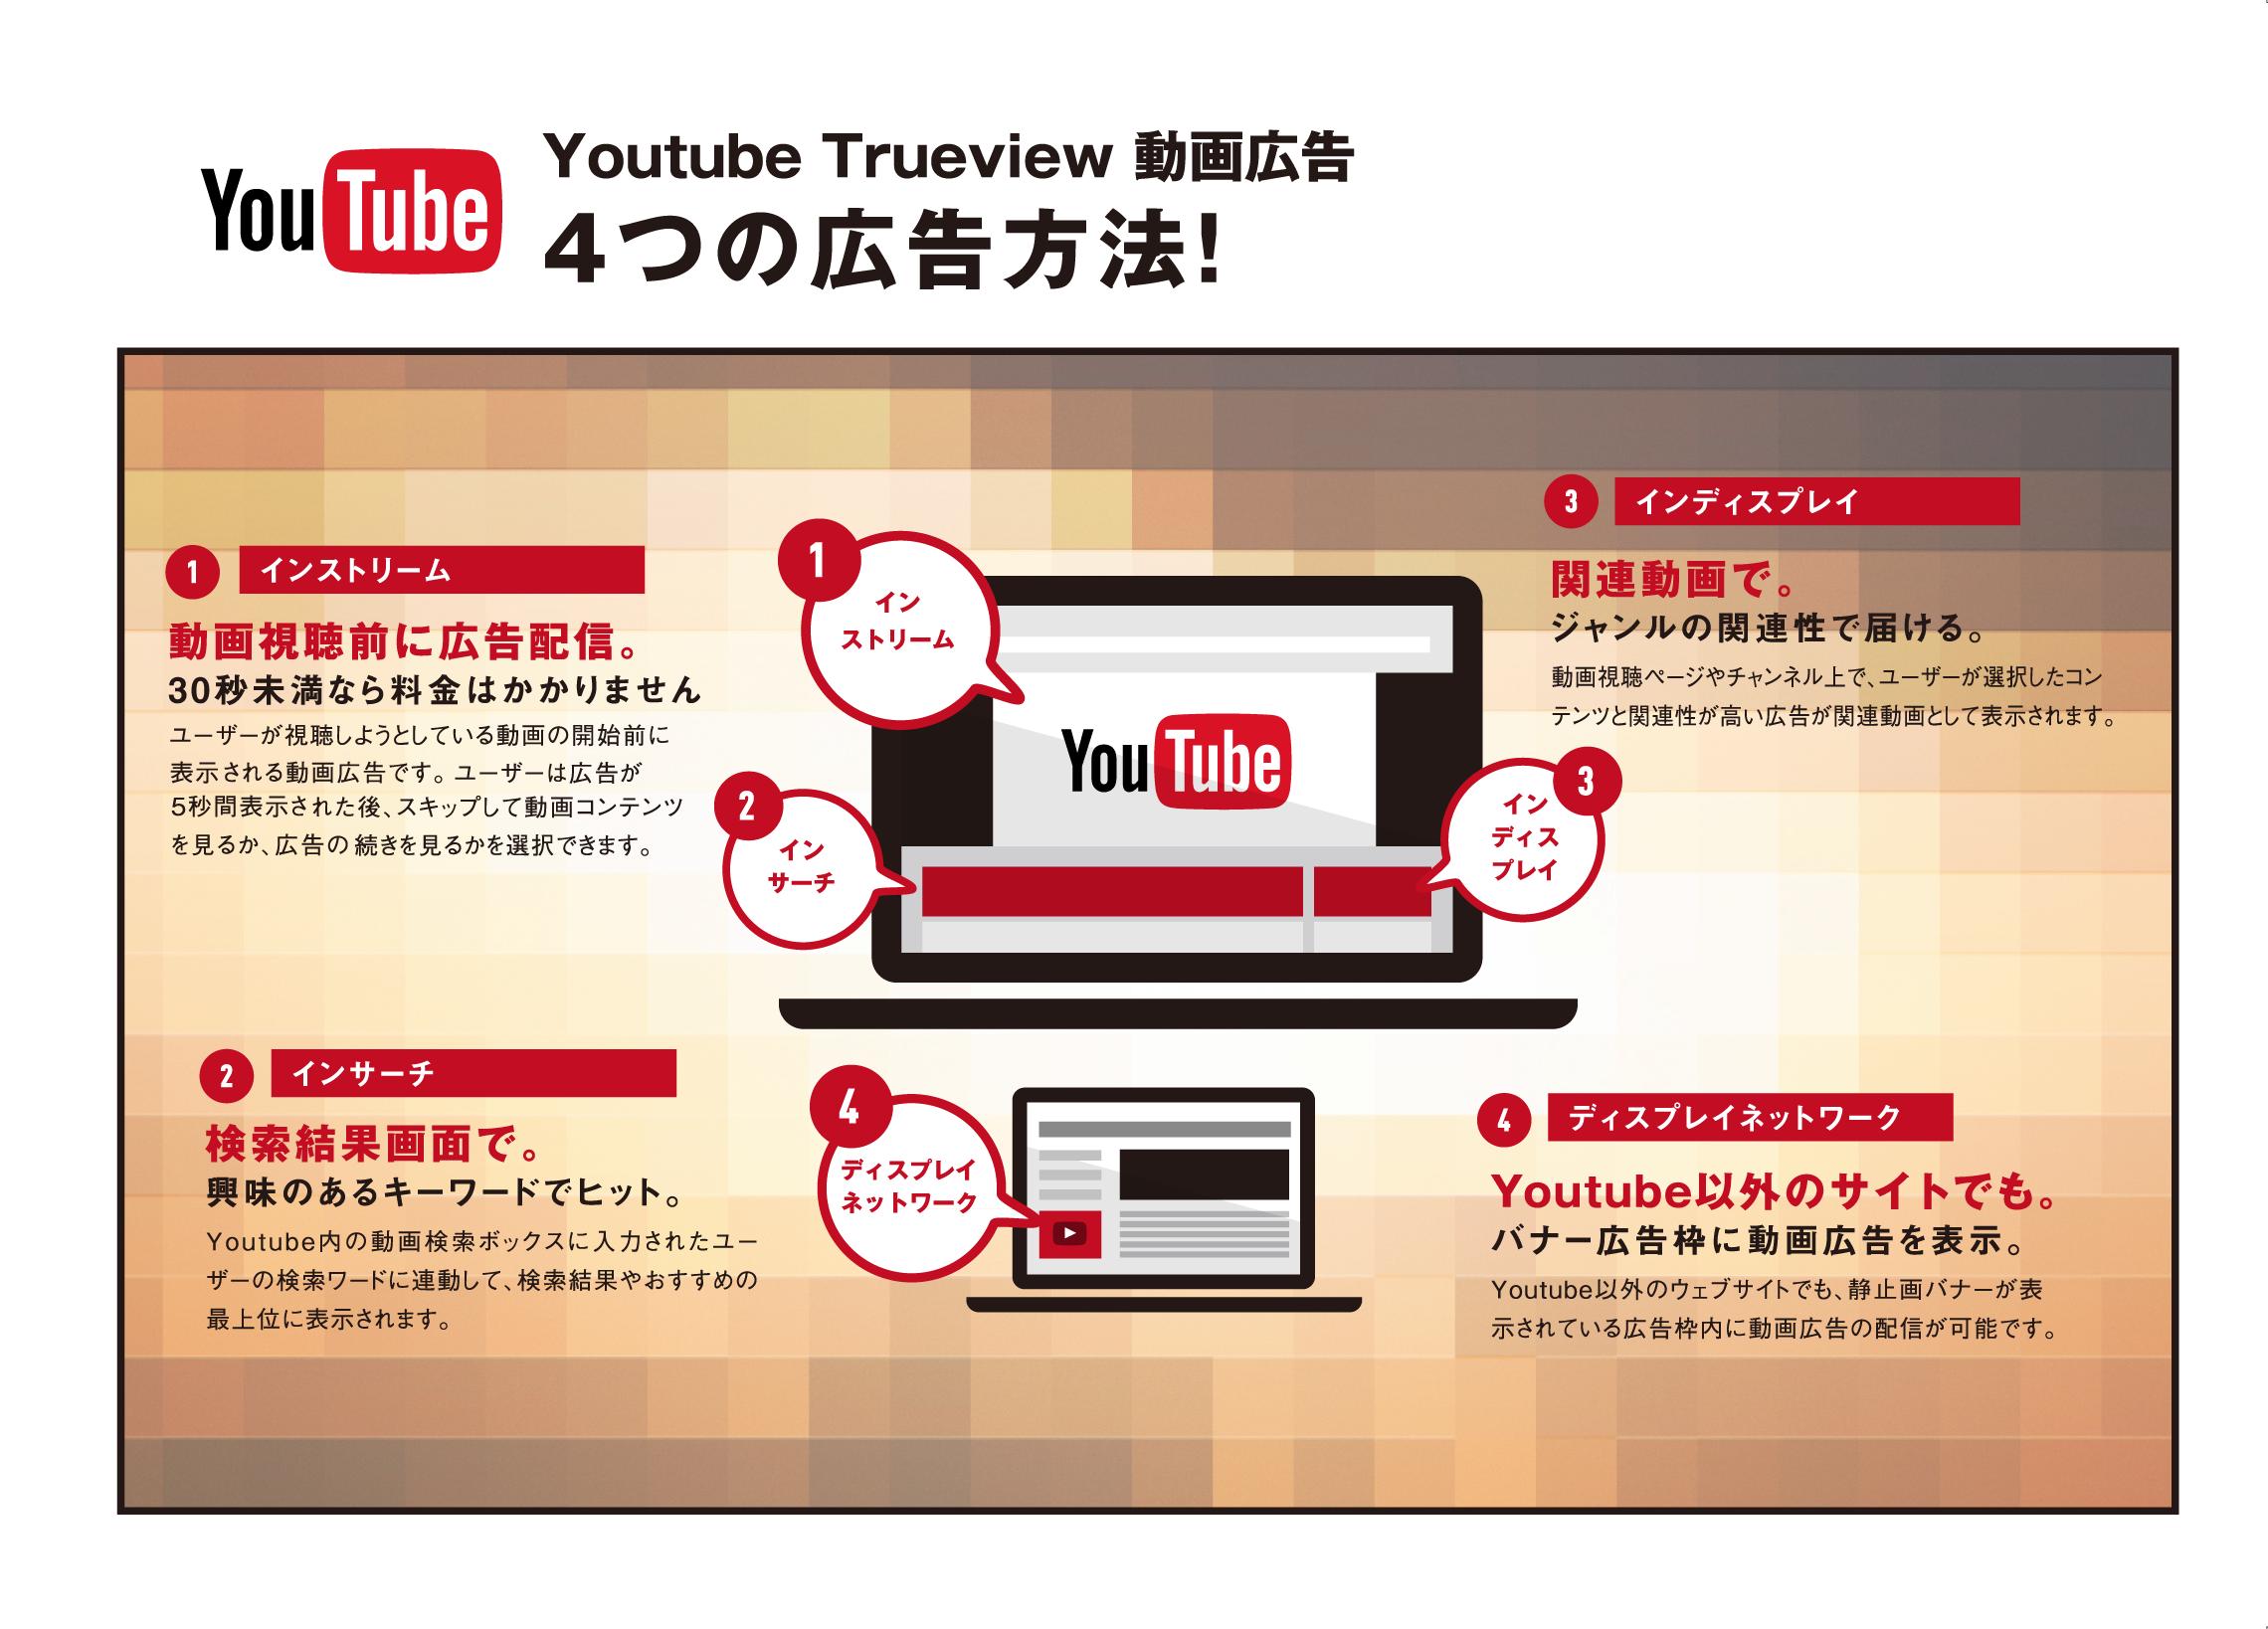 Youtube Trueview 広告 広告方法